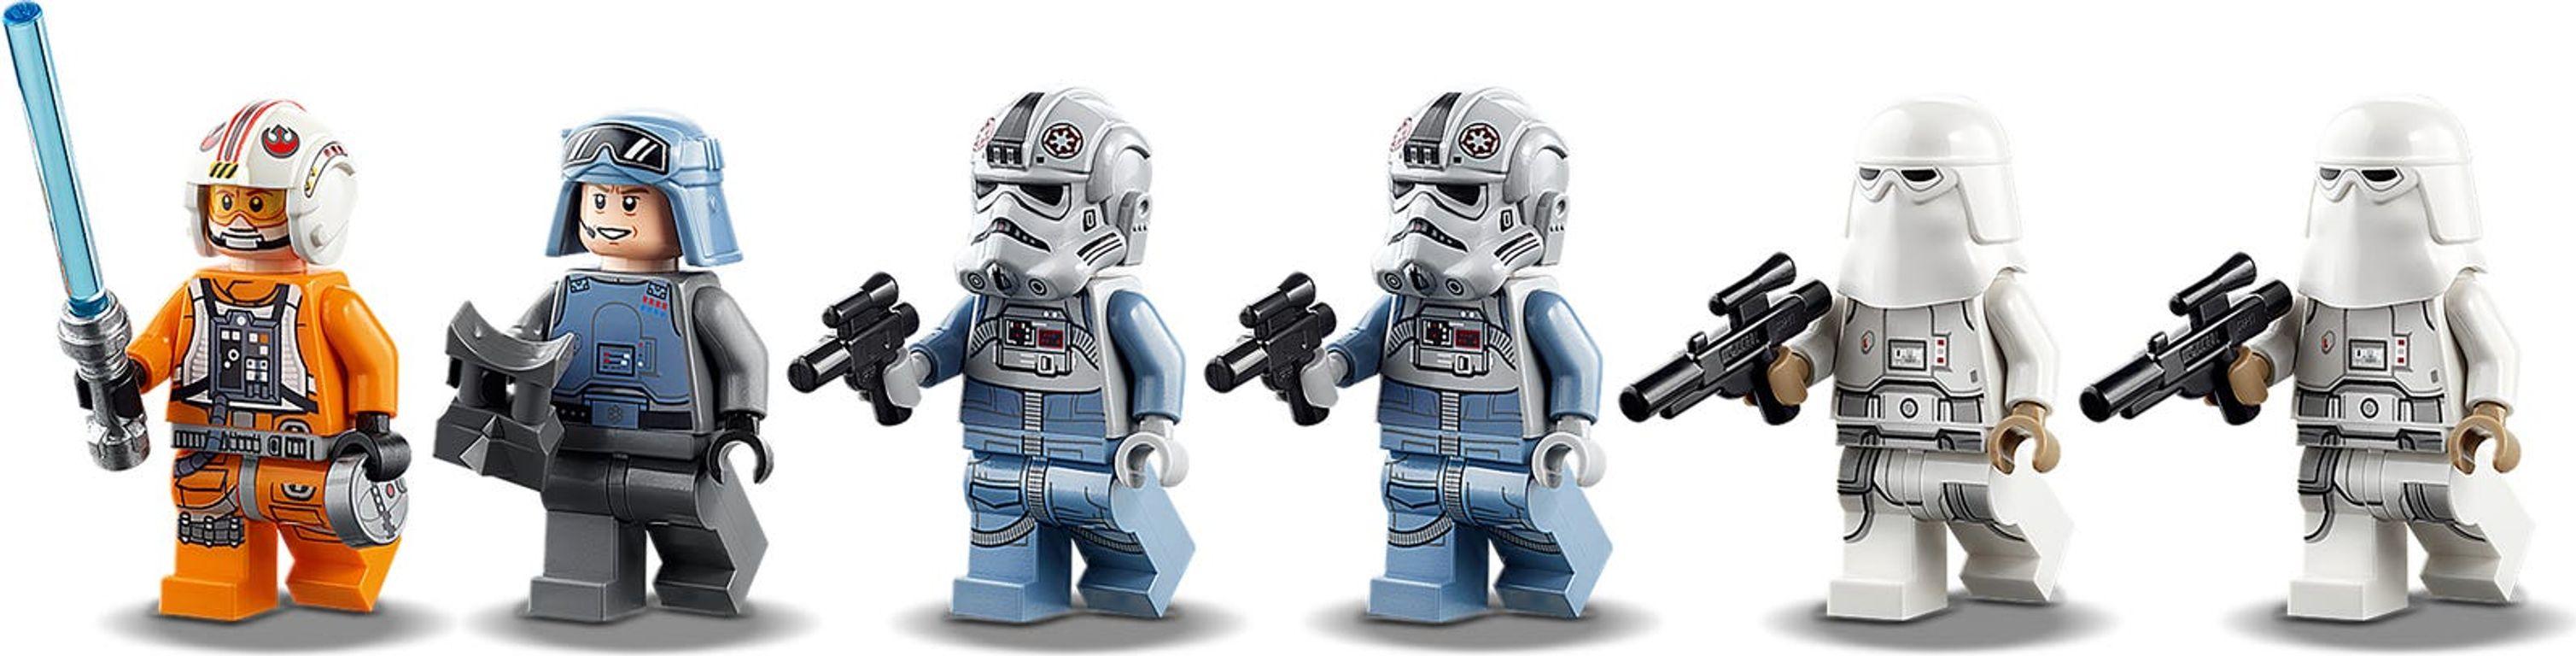 LEGO® Star Wars AT-AT™ minifigures